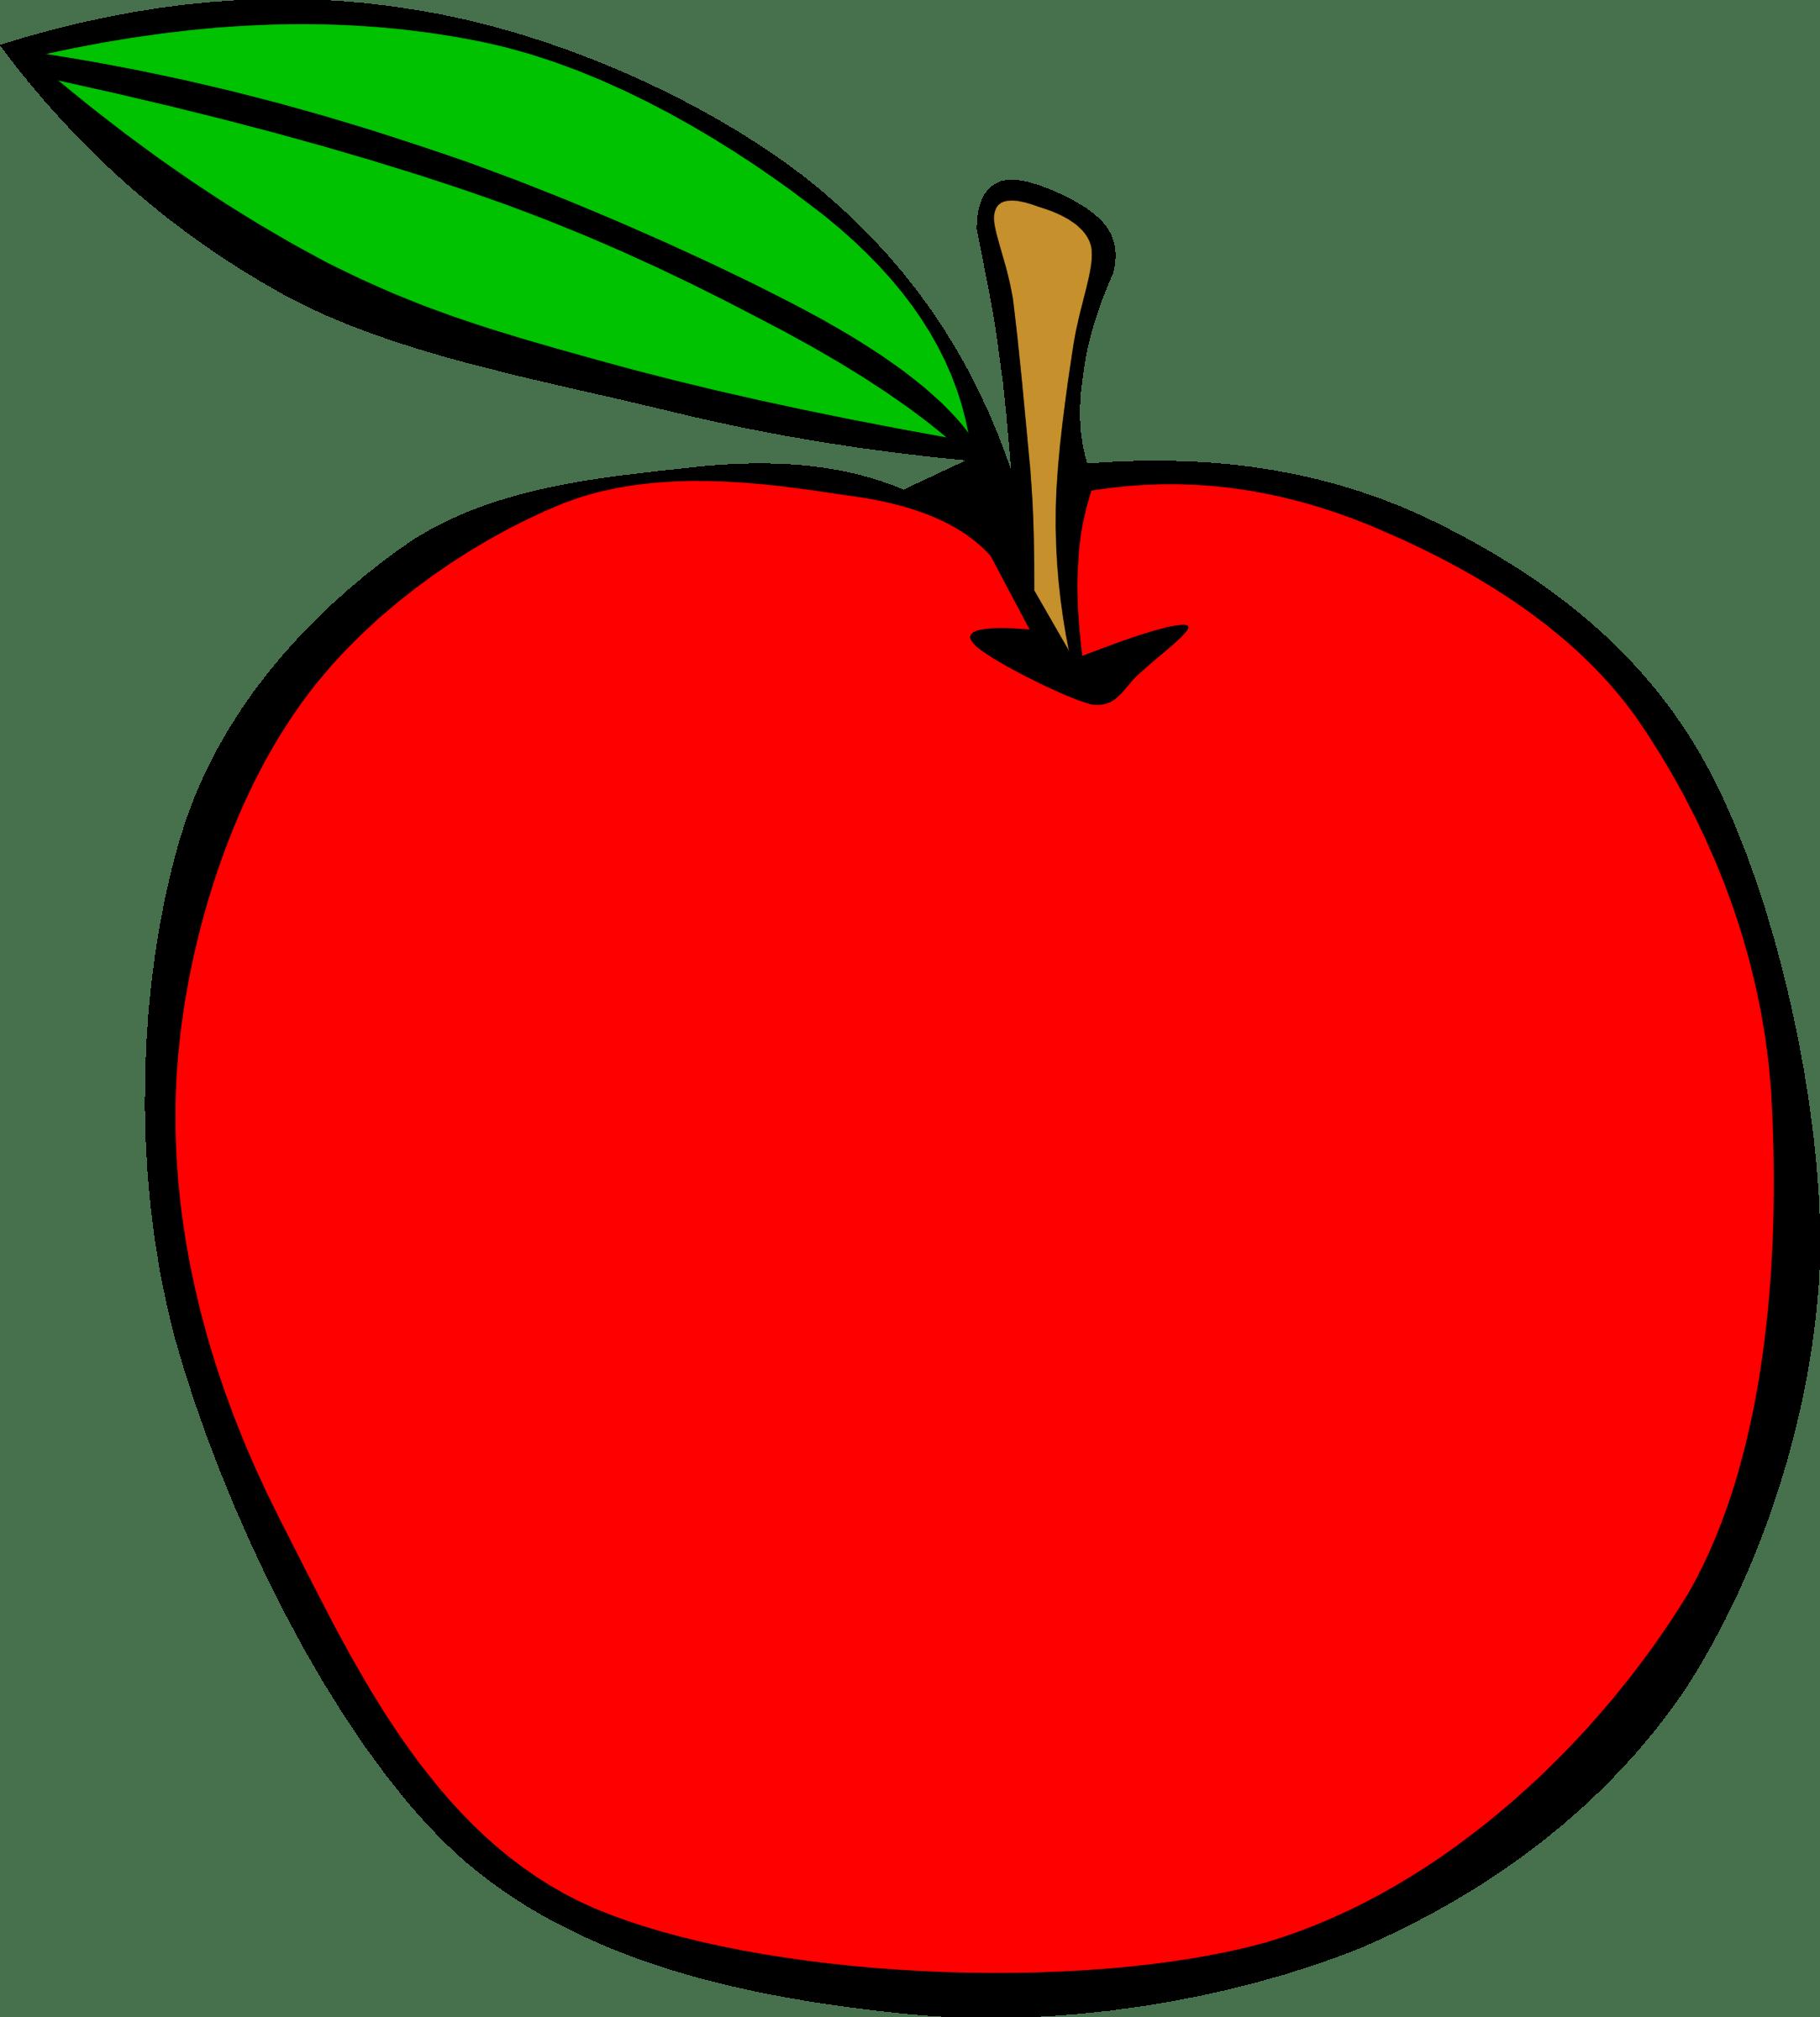 Teachers Apple Clipart